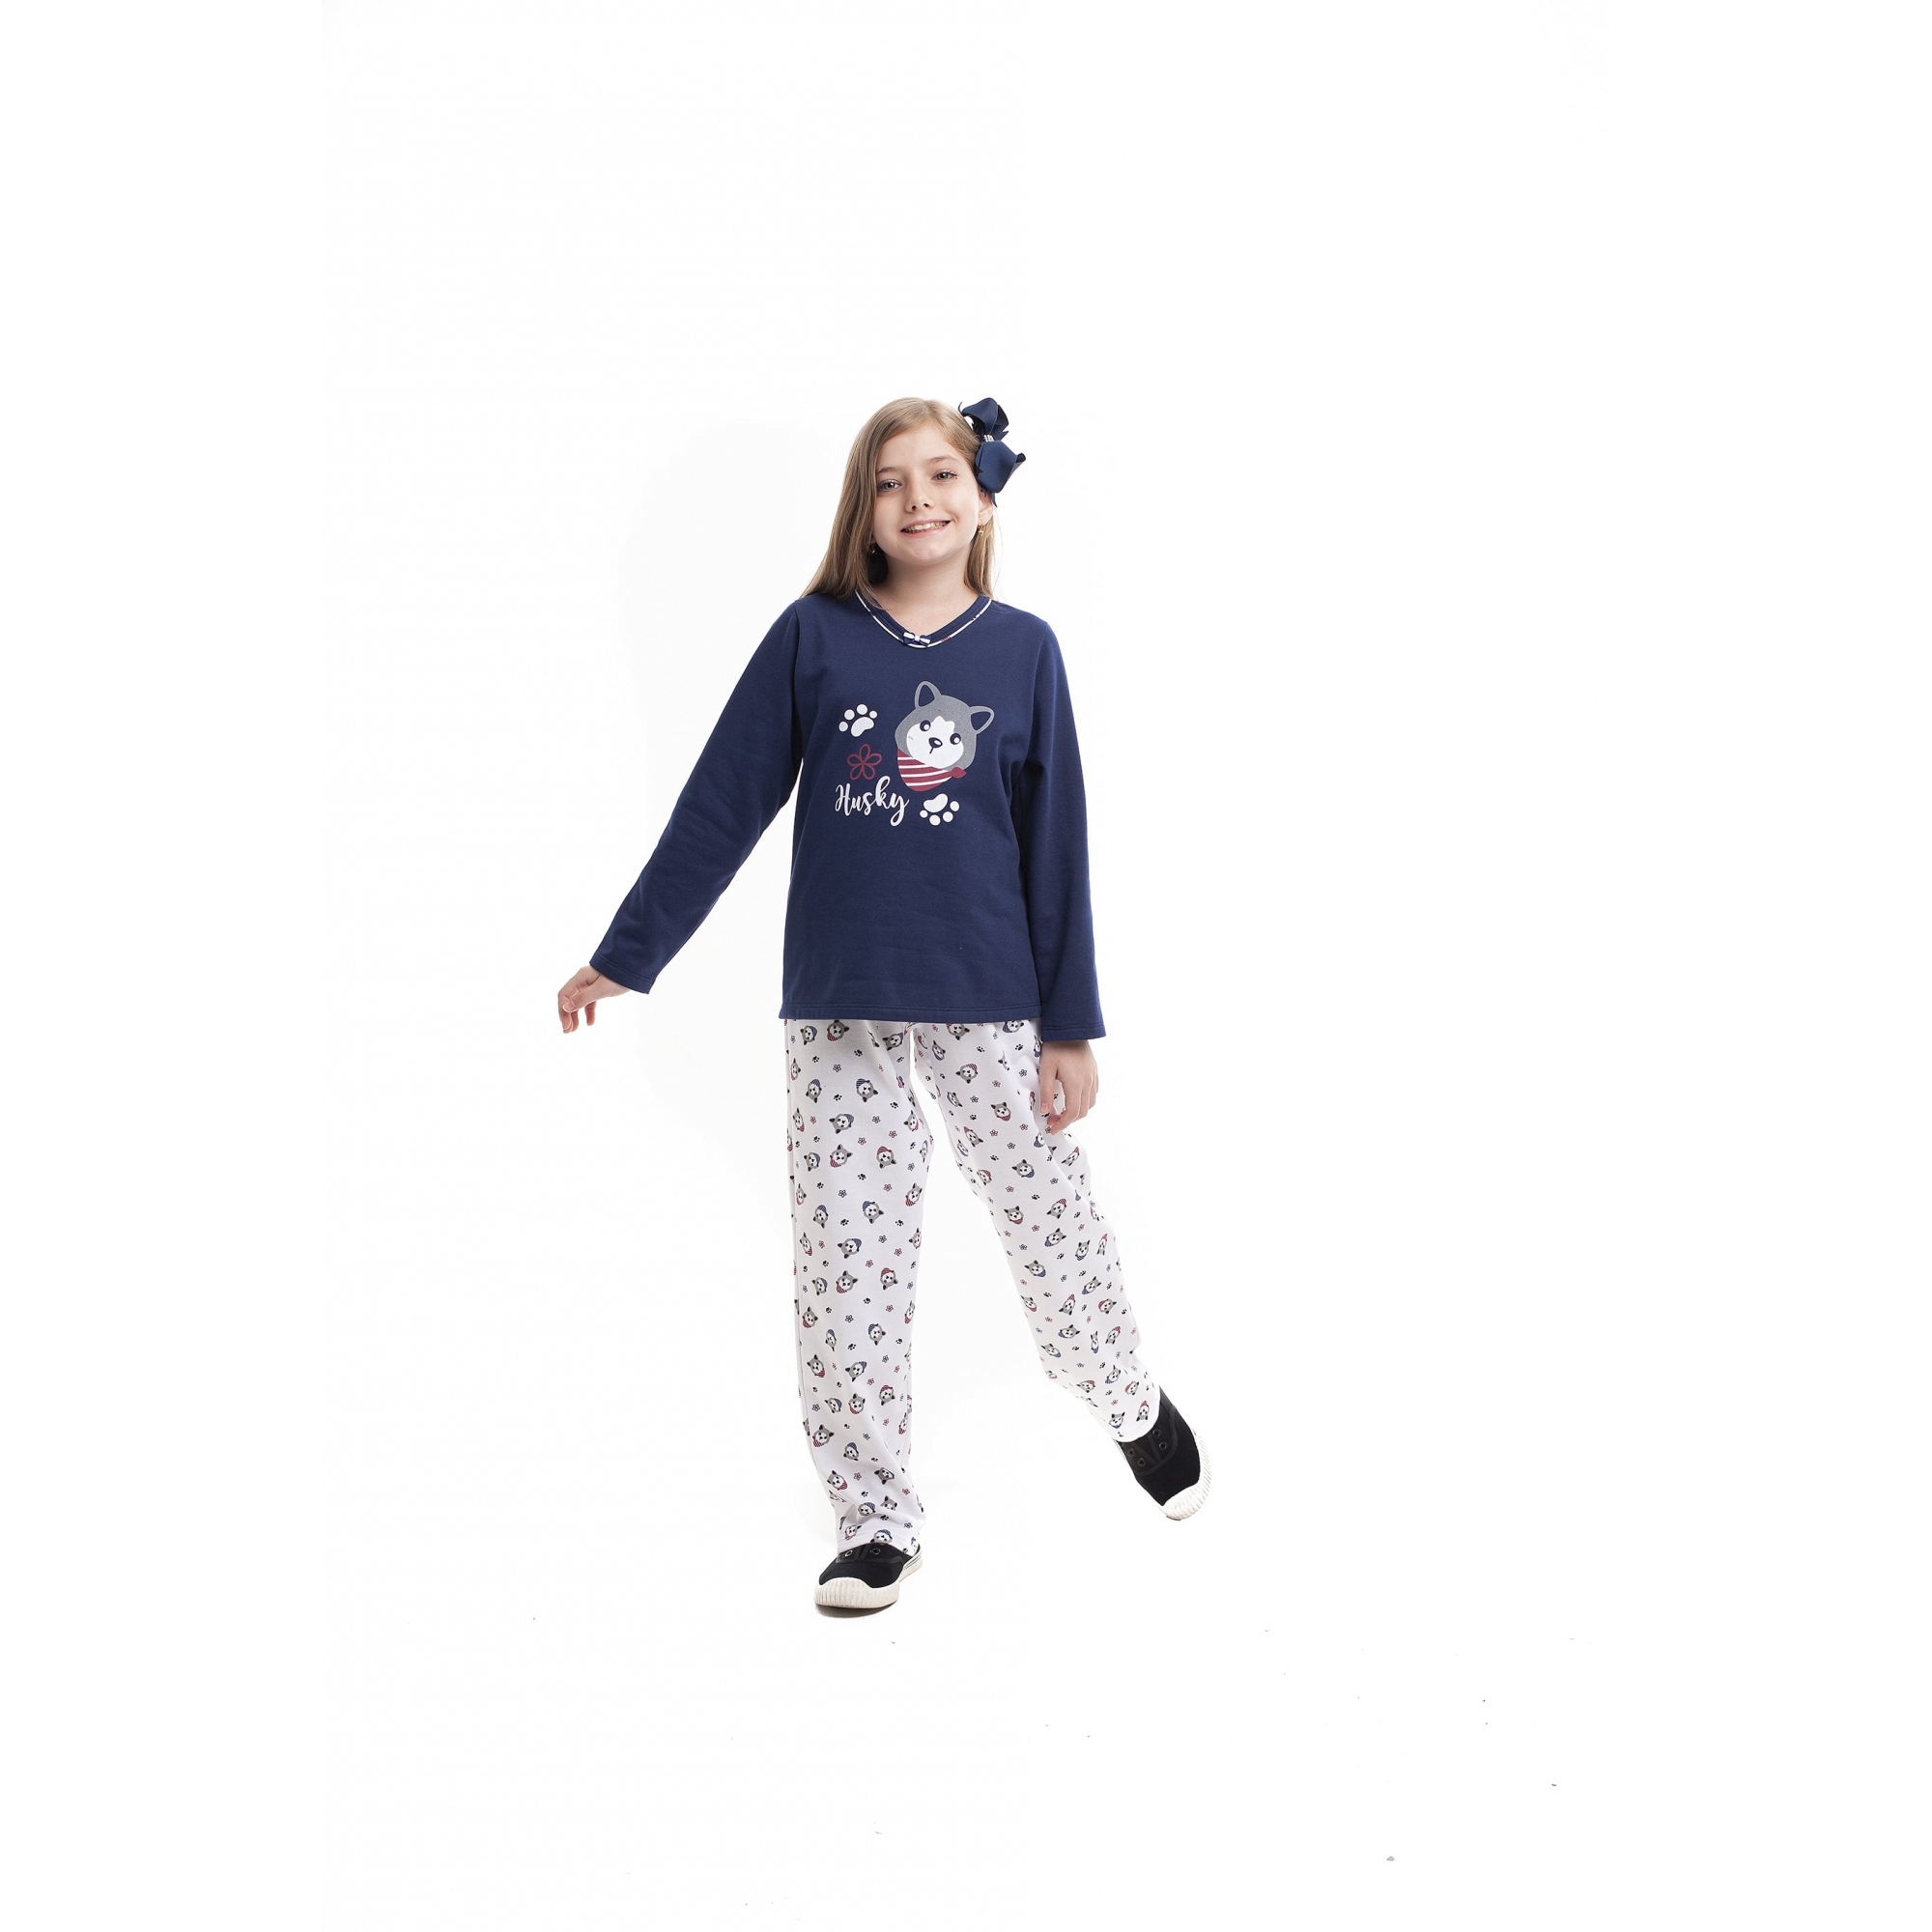 Pijama Infanti Paulienne Flanelado Marinho Husky 37265